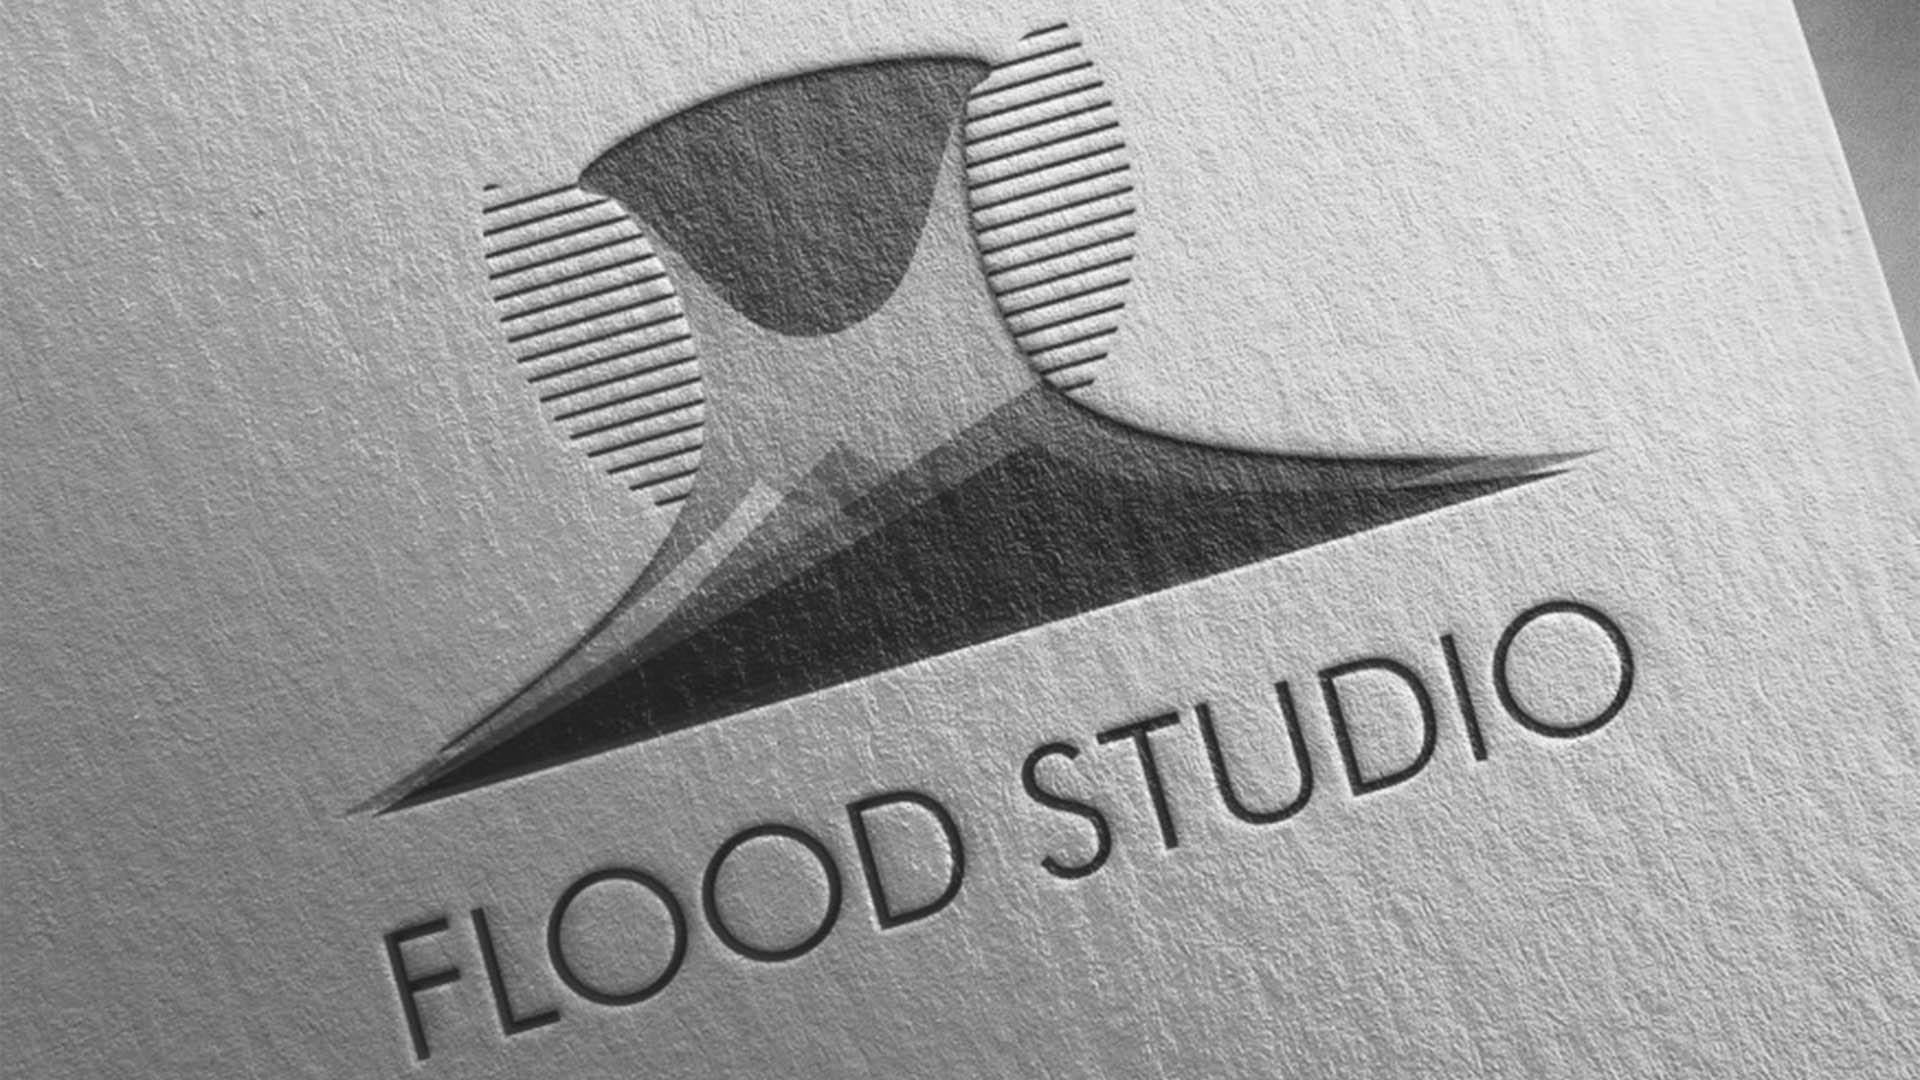 saint loupe, digital agency birmingham, creative studio uk, content production, web agency, marketing agency birmingham, logo design birmingham